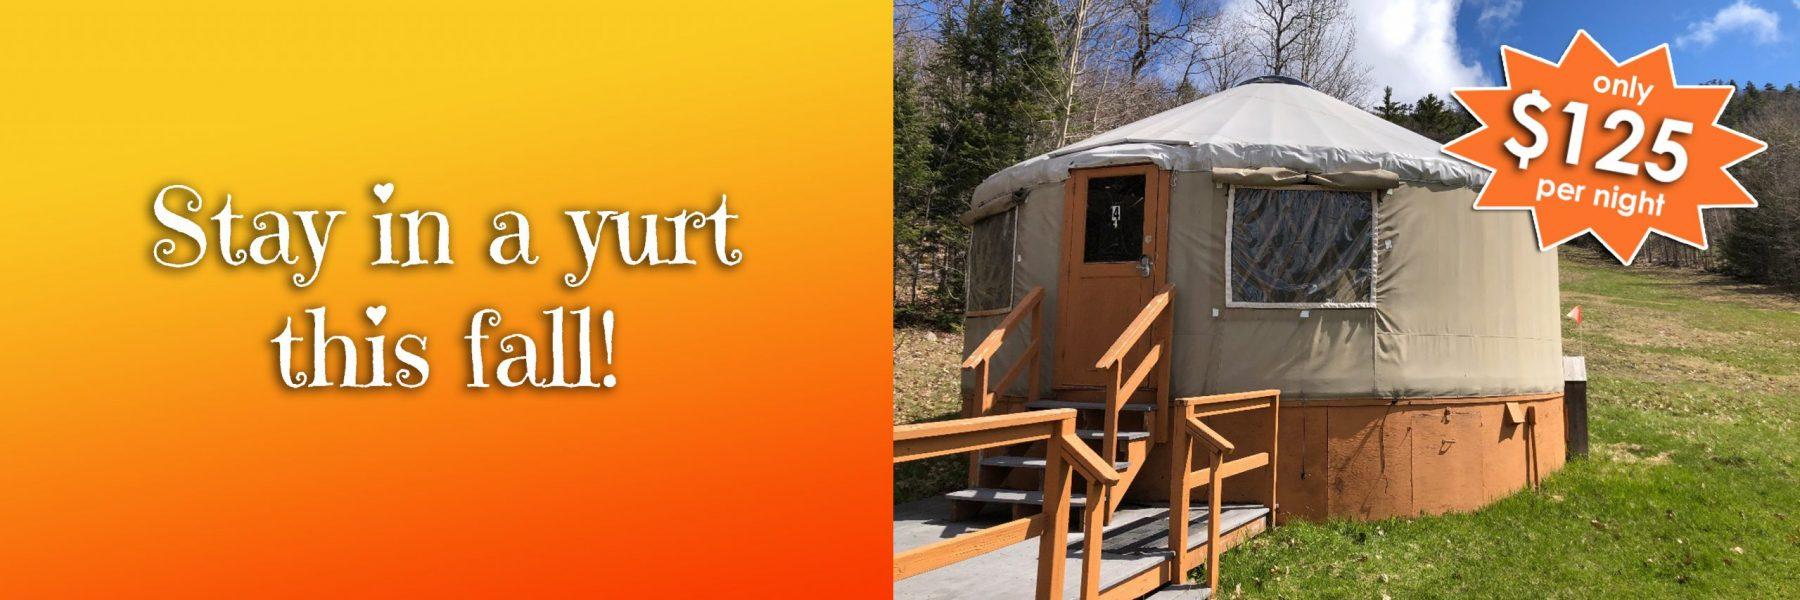 yurt fall 2021